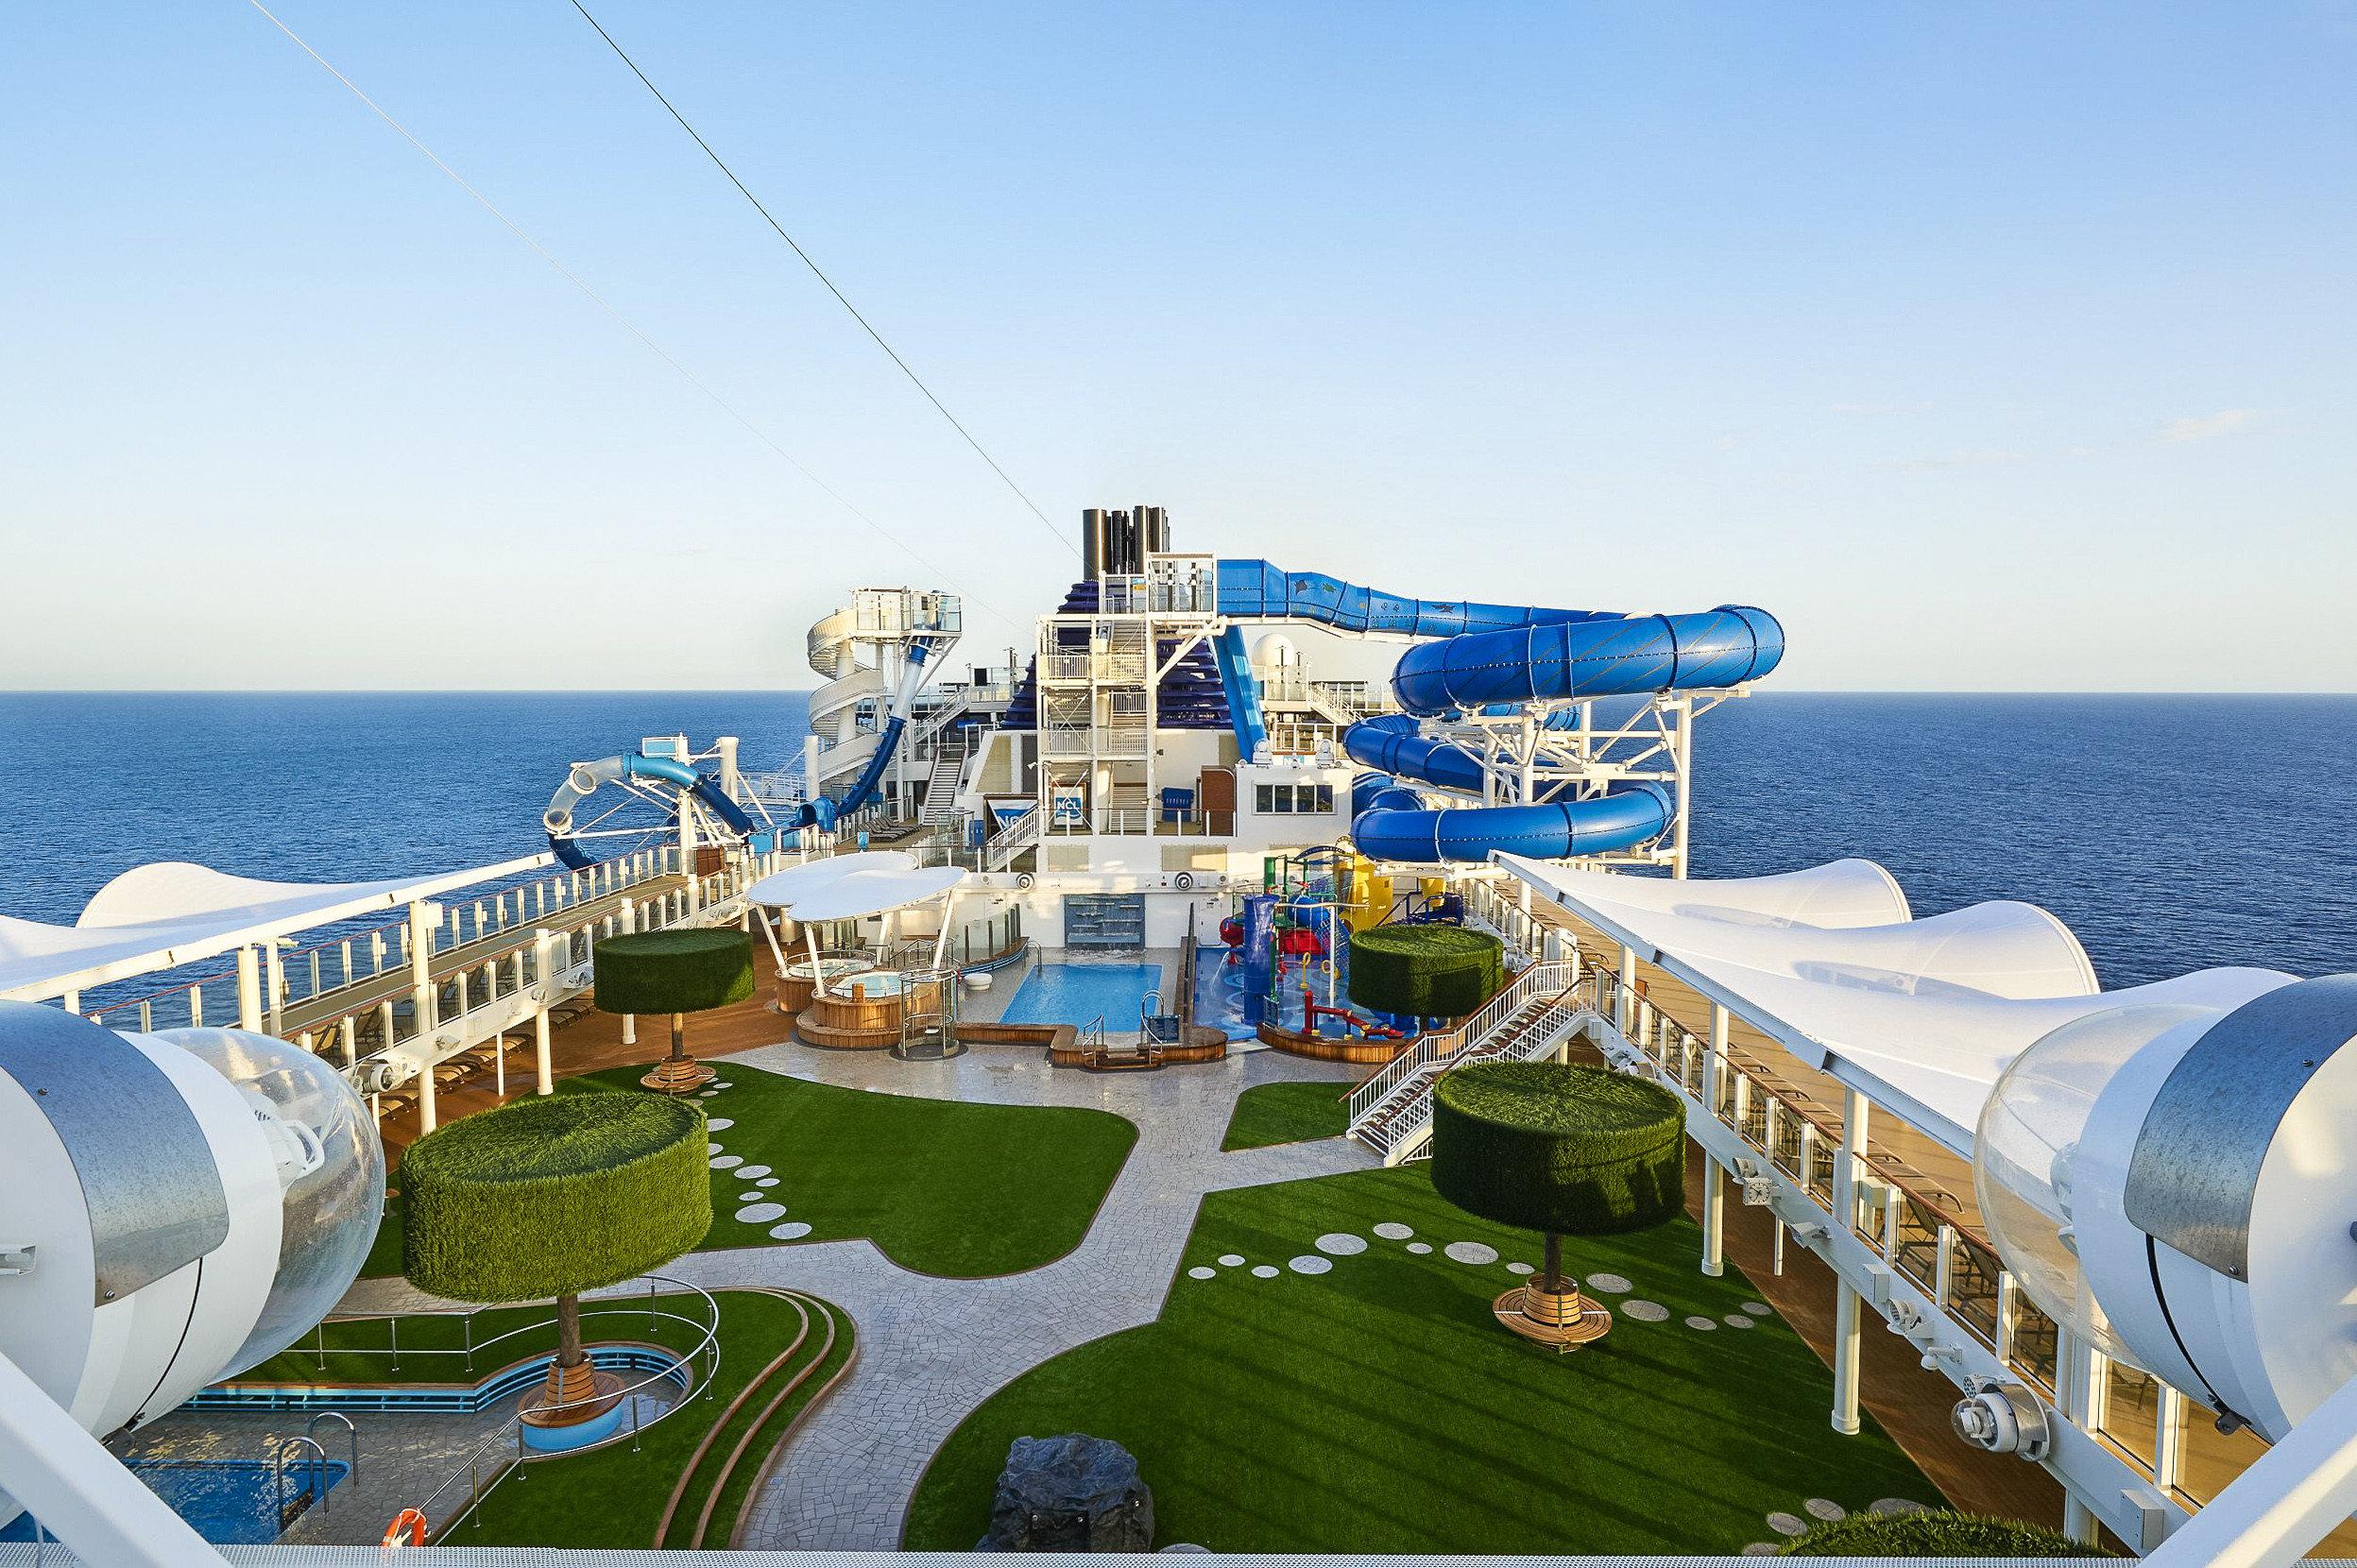 Cruise Travel Luxury Travel Trip Ideas sky outdoor water Boat ship passenger ship watercraft cruise ship Sea vehicle leisure recreation tourism day